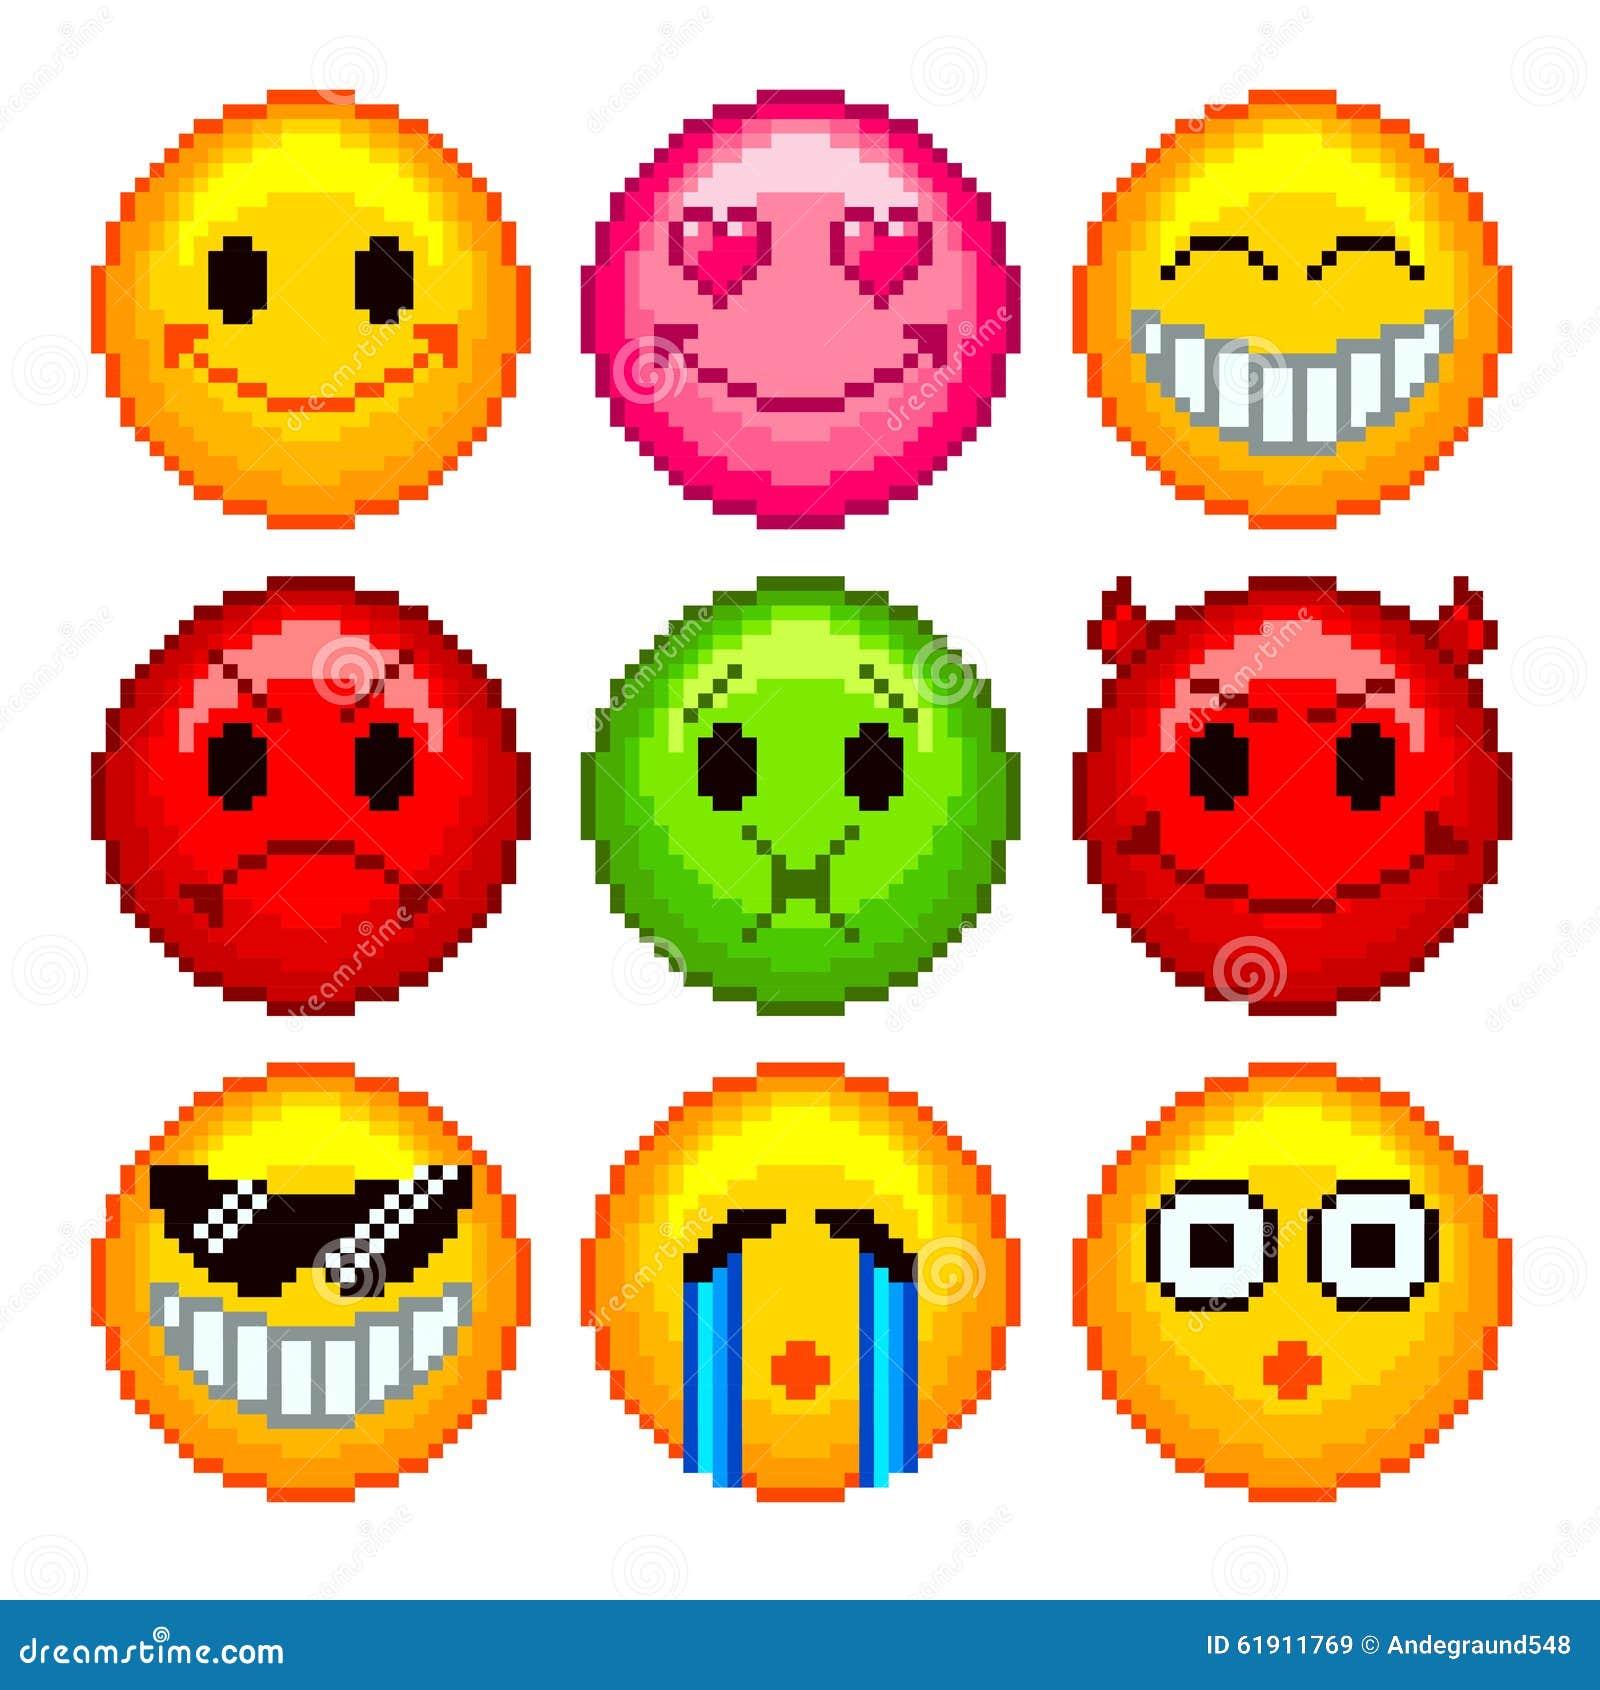 facebook app image url WcNi